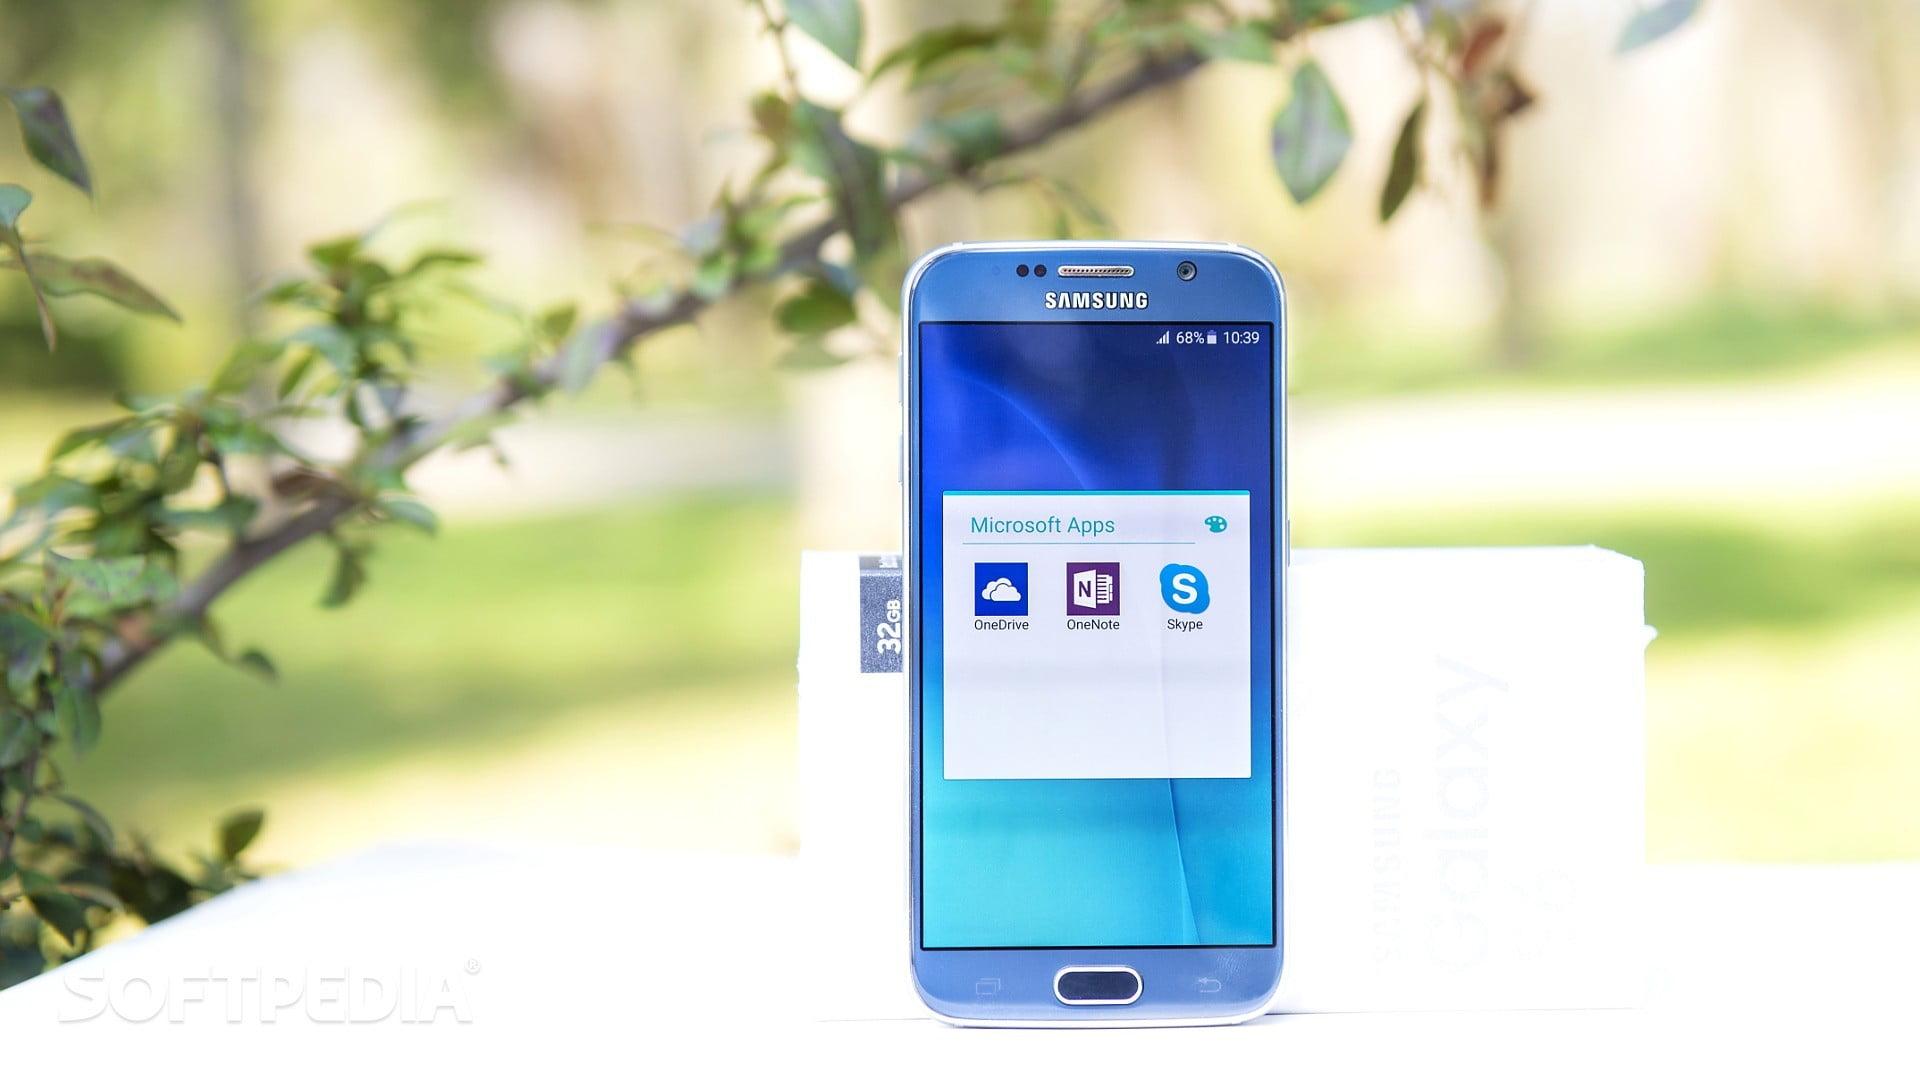 Samsung Galaxy S6 con Microsoft Apps